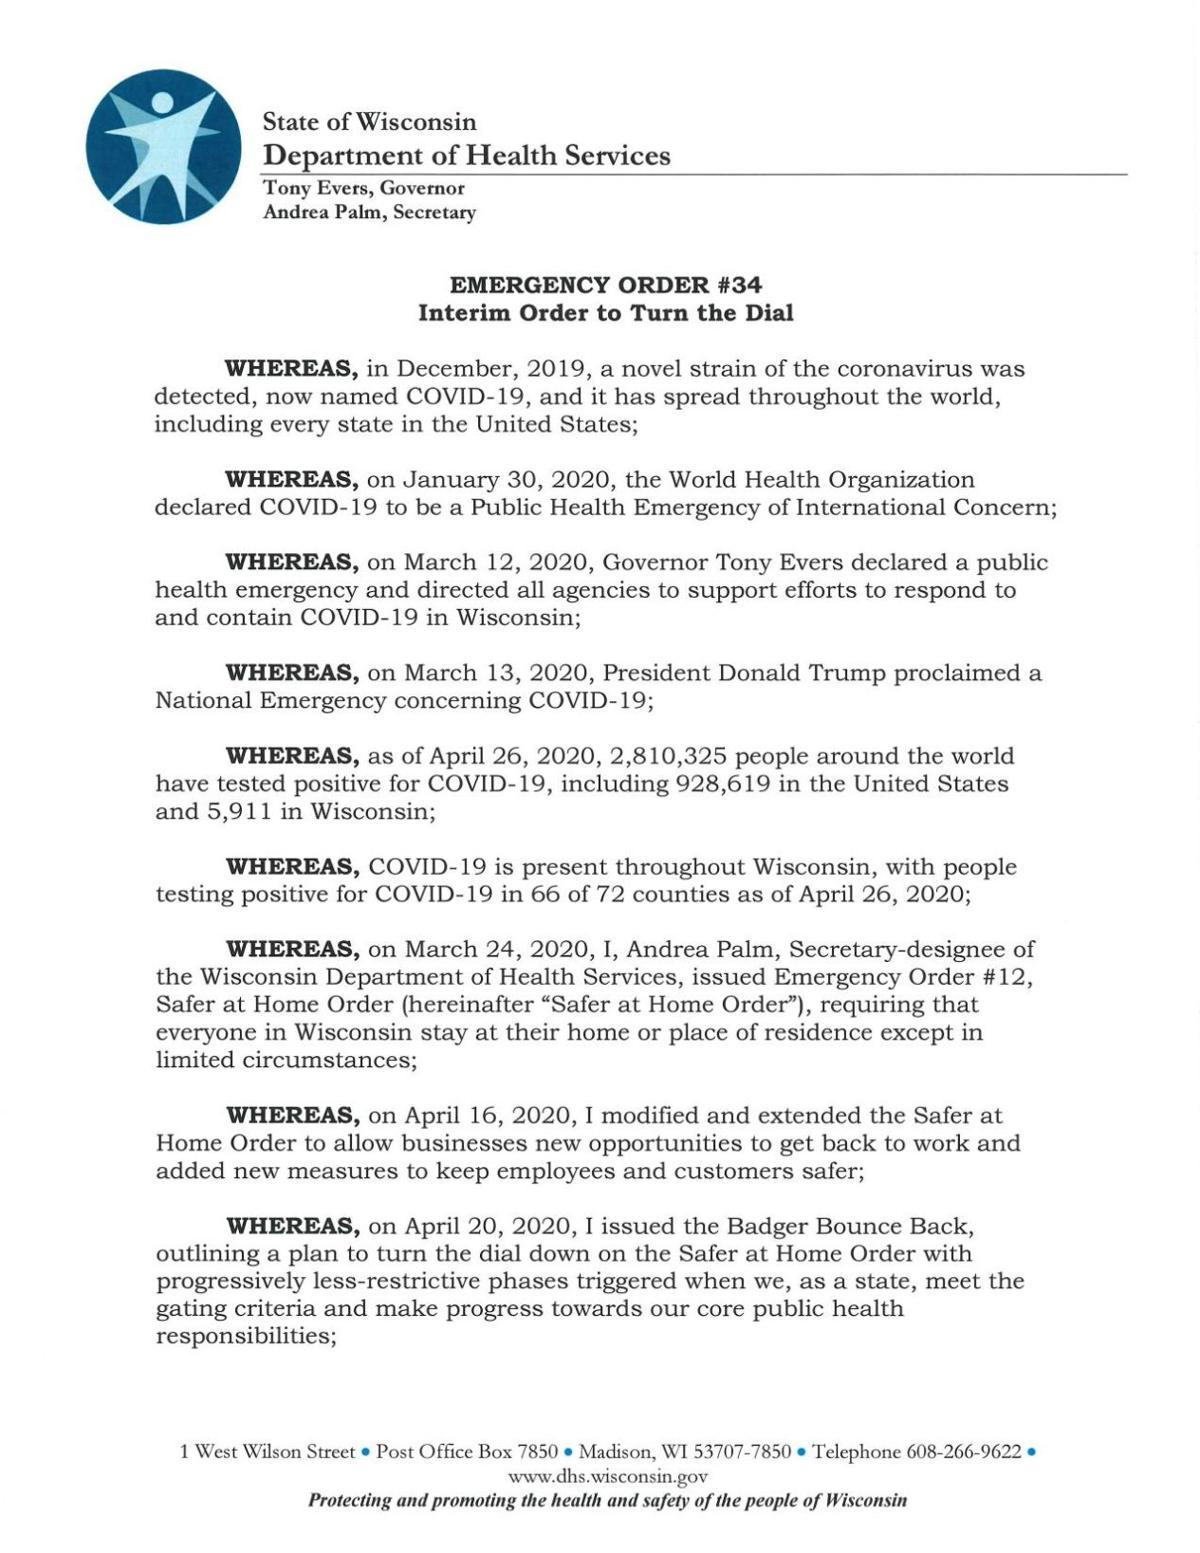 Gov. Evers Emergency Order, 4-27-20